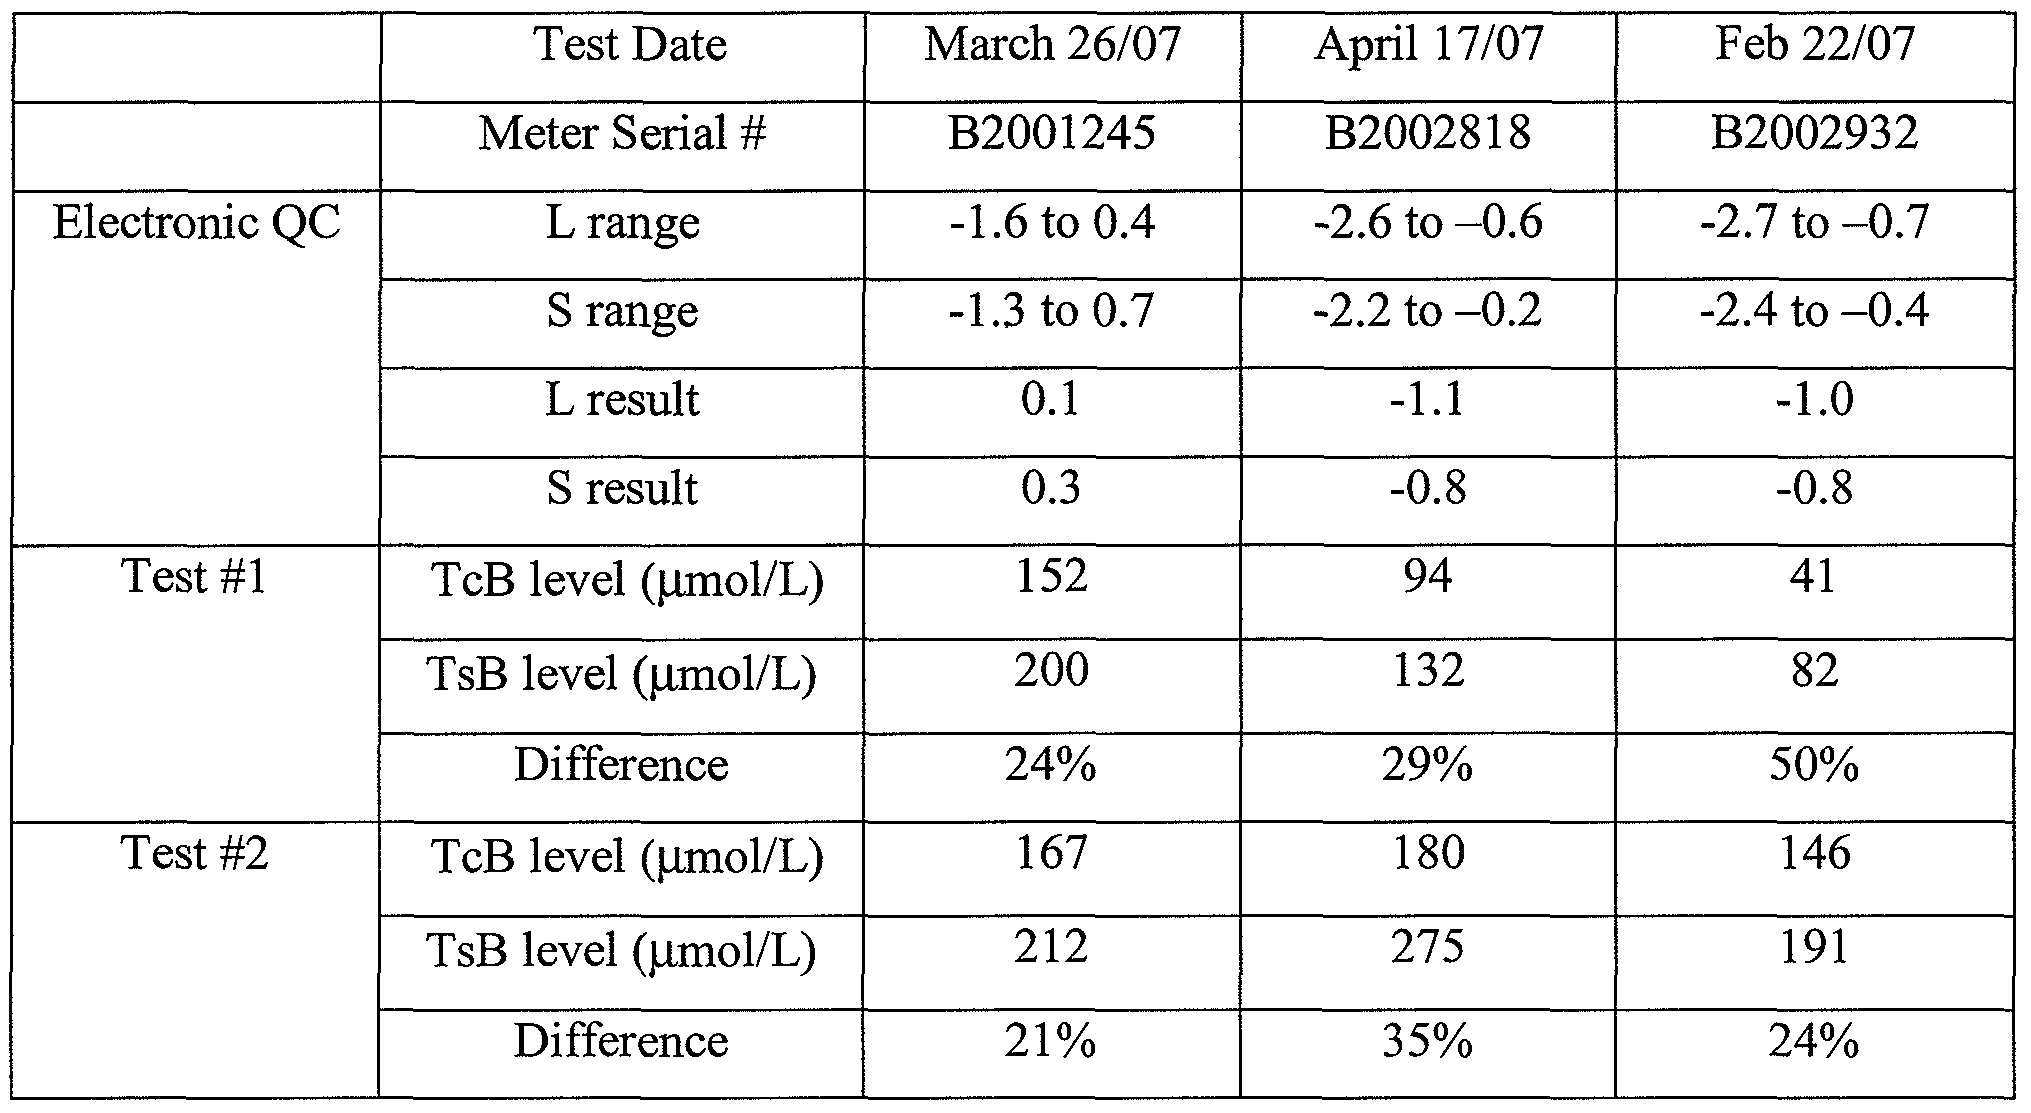 jaundice bilirubin level chart for adults: Normal bilirubin levels in newborns chart jaundice in newborns